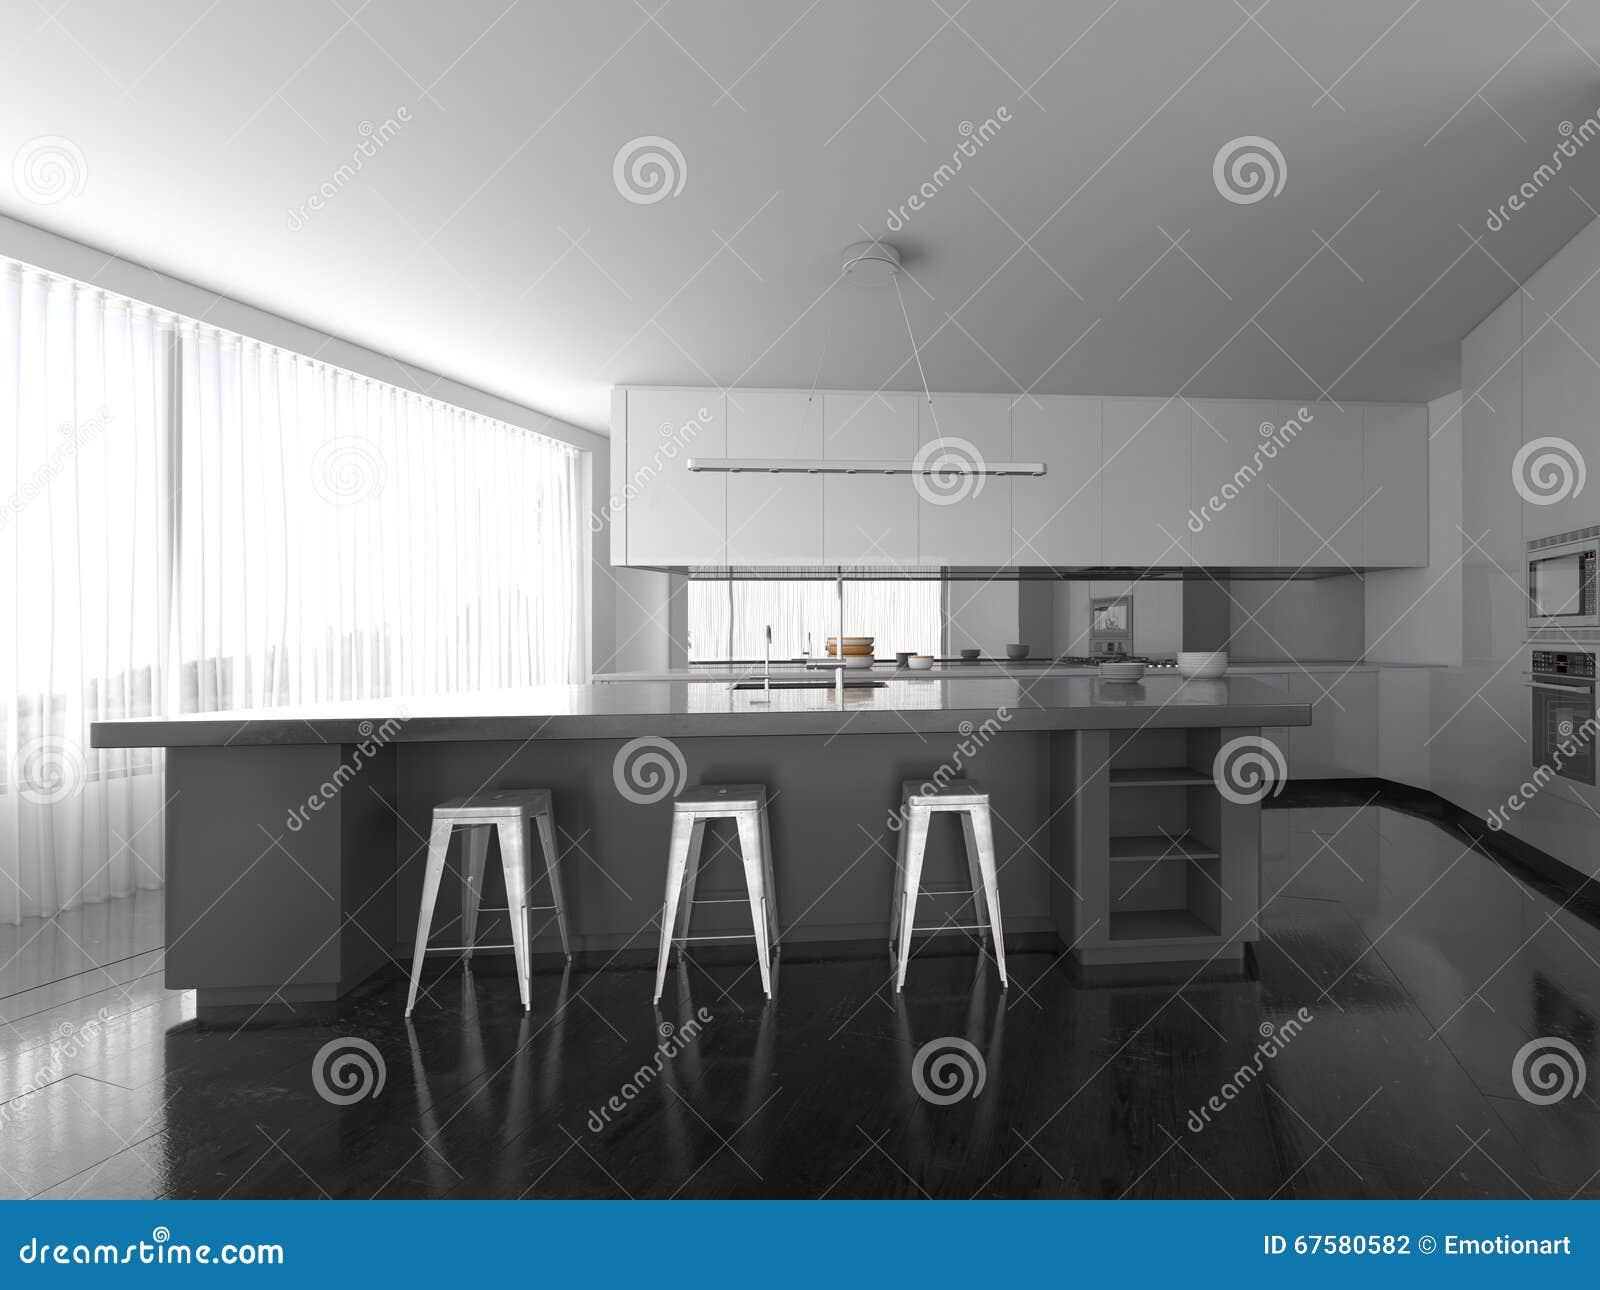 Slaapkamer wallpaper - Witte en grijze keuken ...